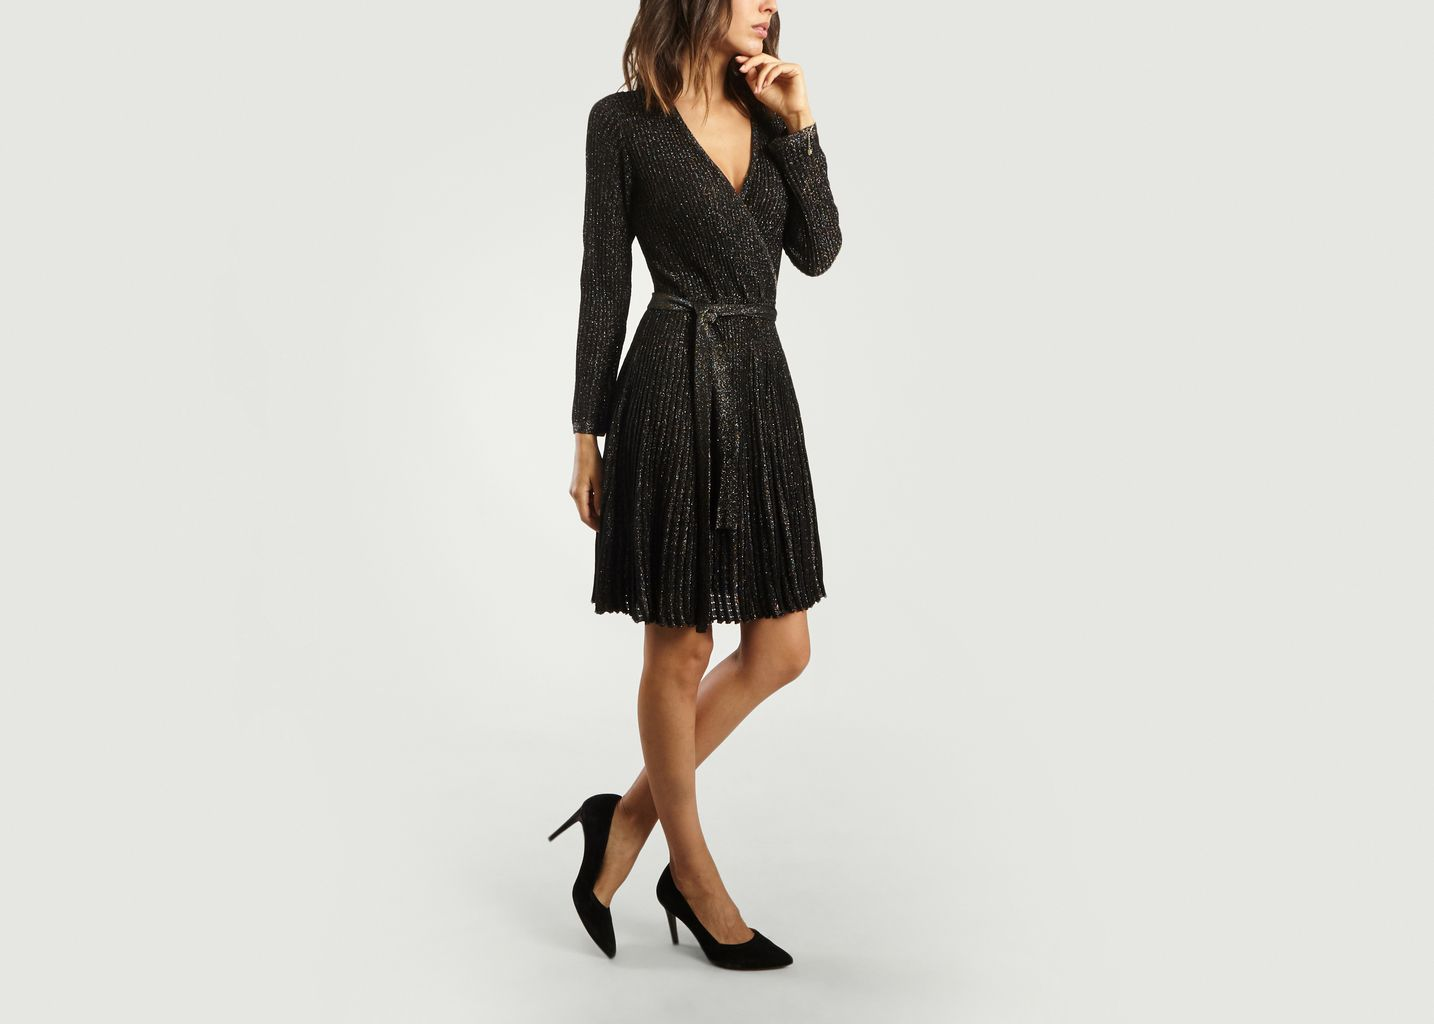 Robe Portefeuille en Lurex - Tara Jarmon